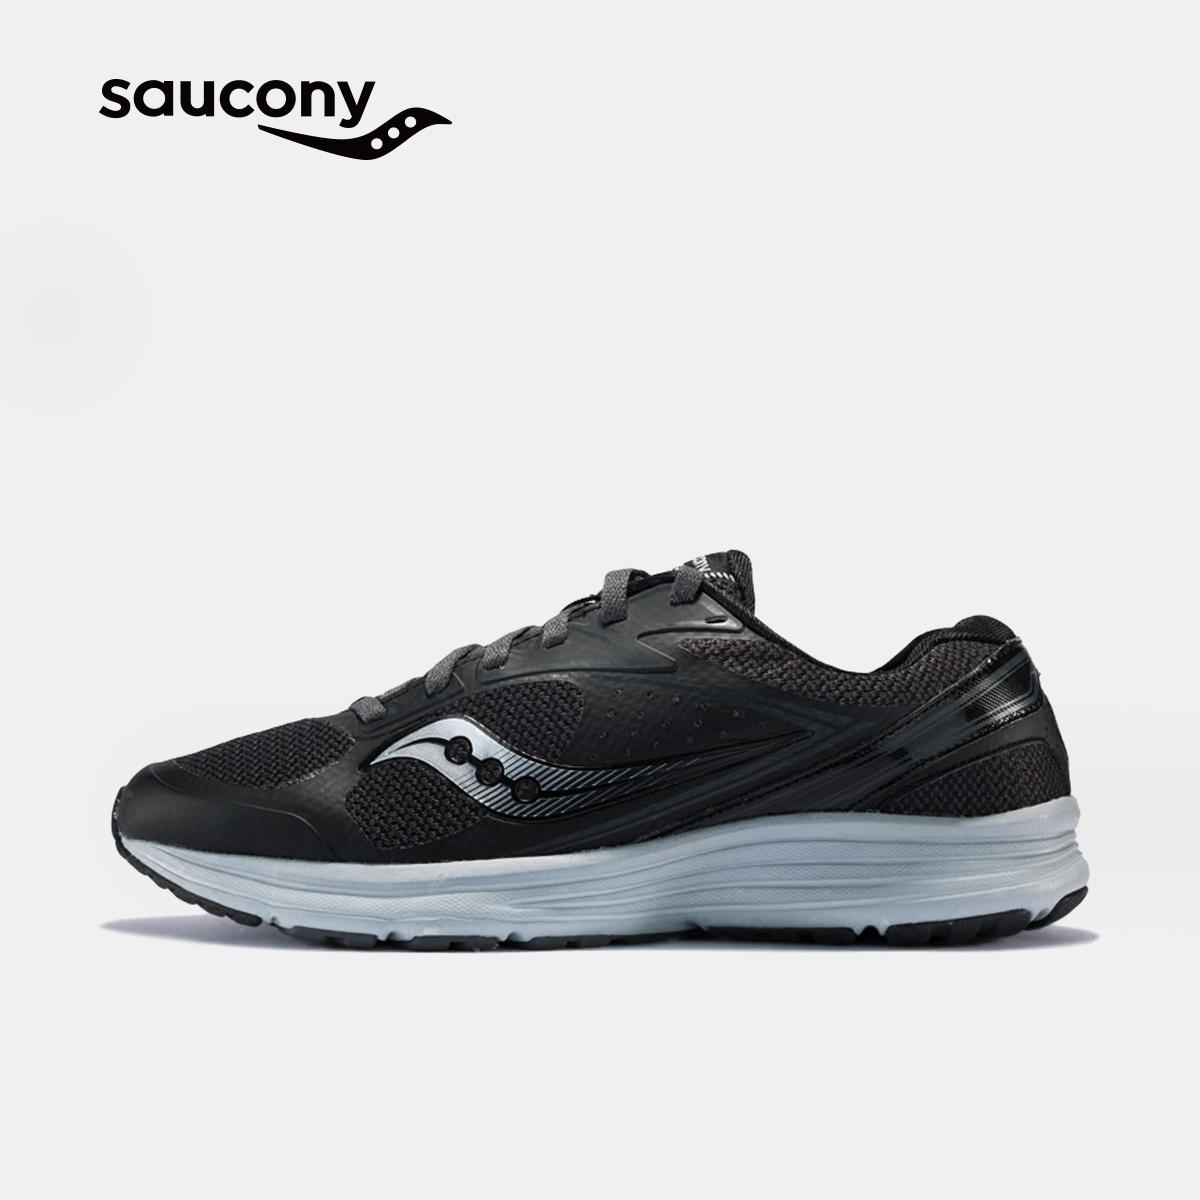 Saucony圣康尼SEEKER缓震跑步鞋 运动鞋男子跑步鞋 S25302